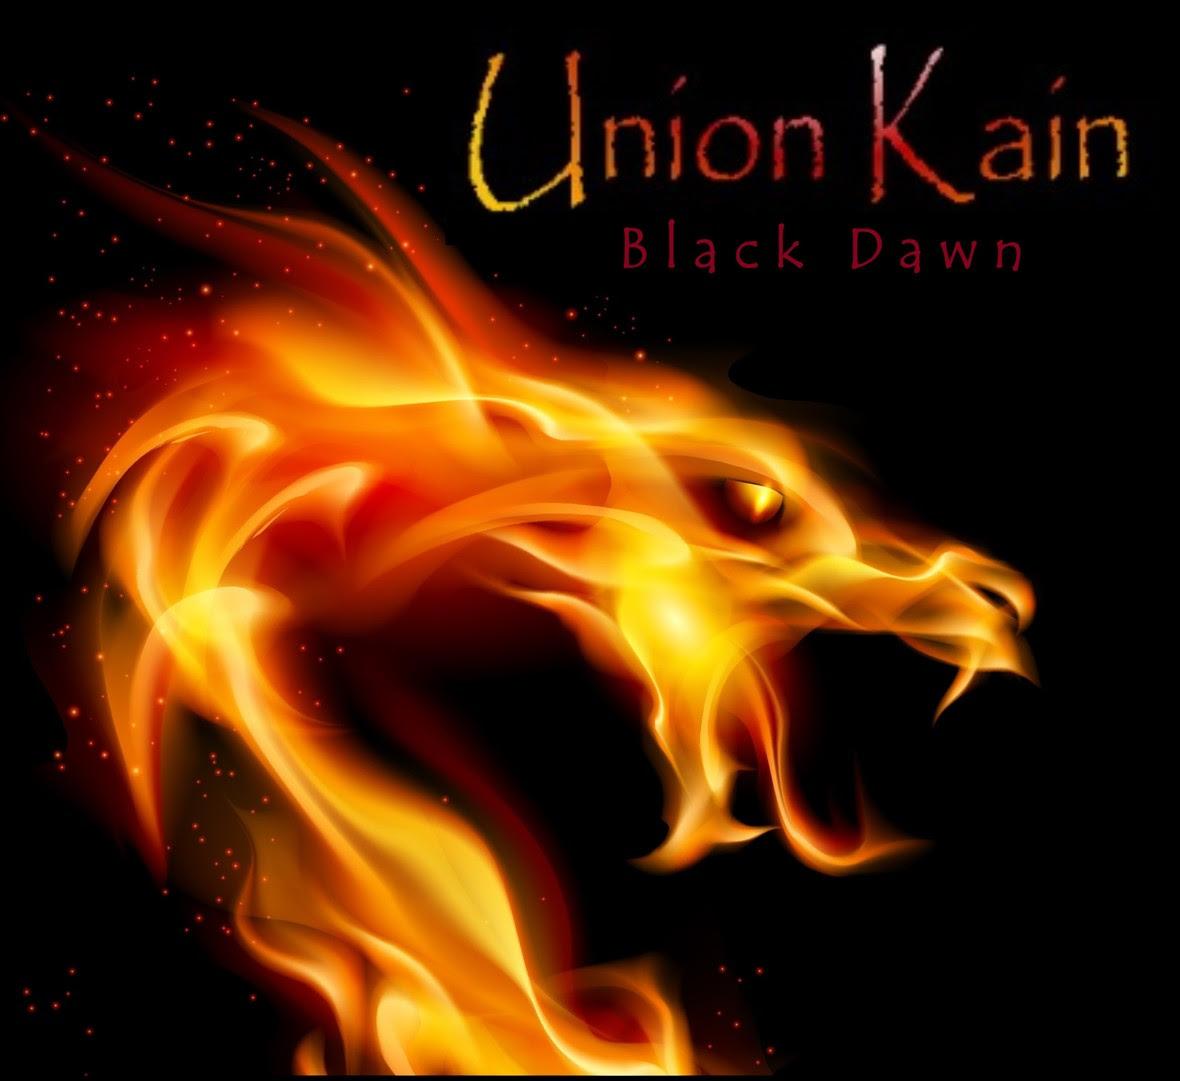 Unon Kain Black Dawn album cover